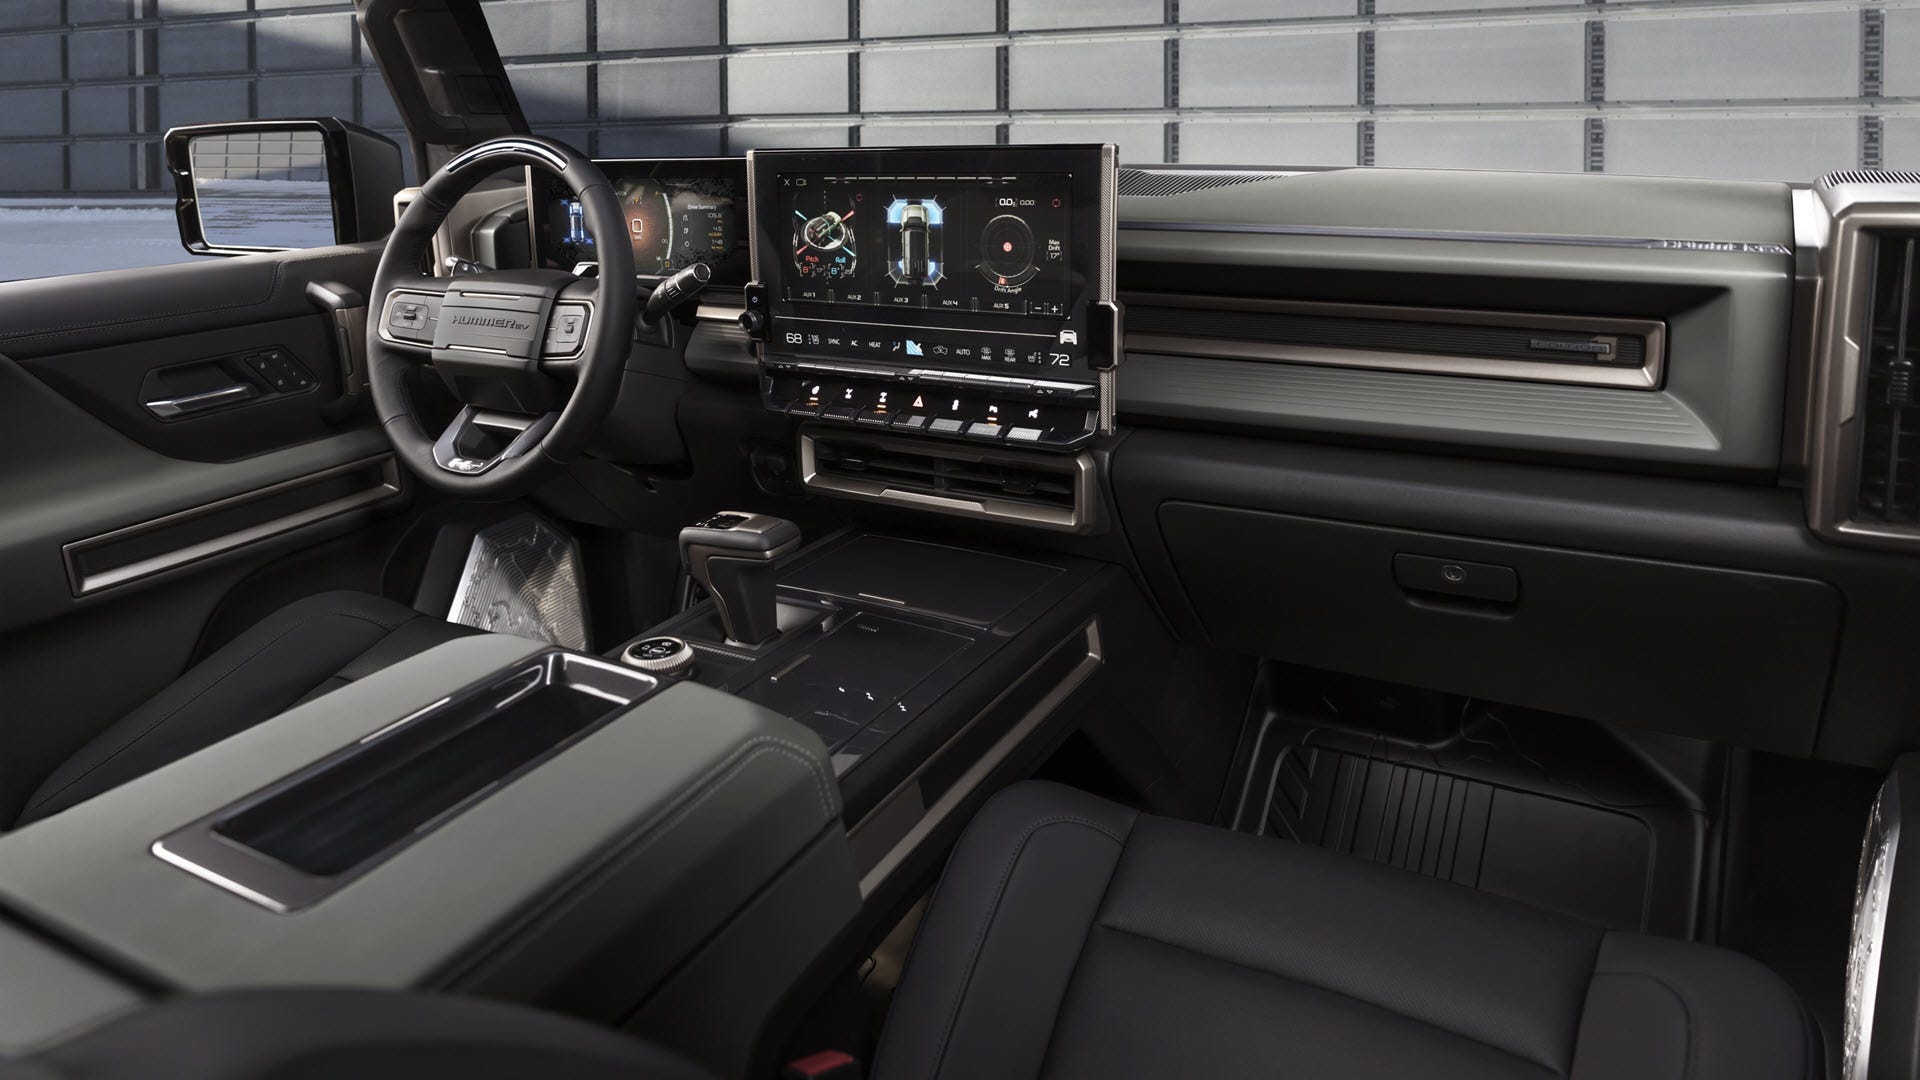 Hummer-SUV-EV-Smartphonegreece (2)